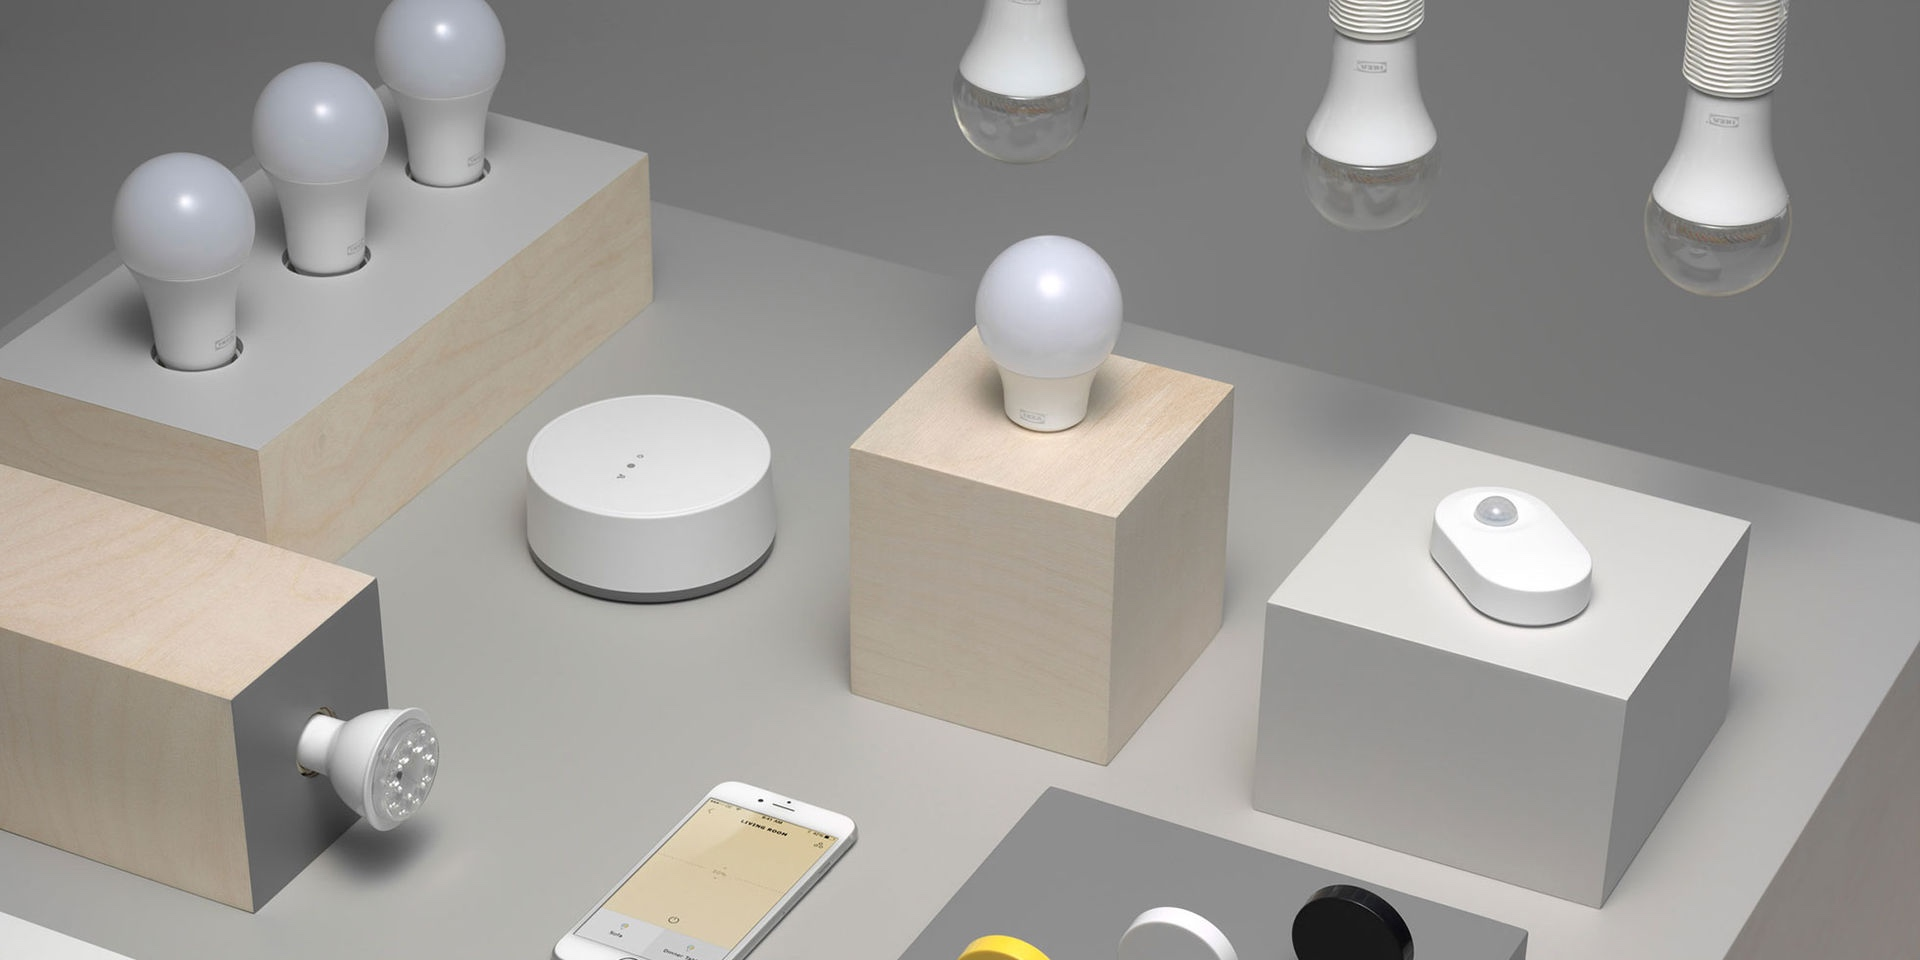 IKEA finally adds HomeKit support to its Tradfri smart lighting range